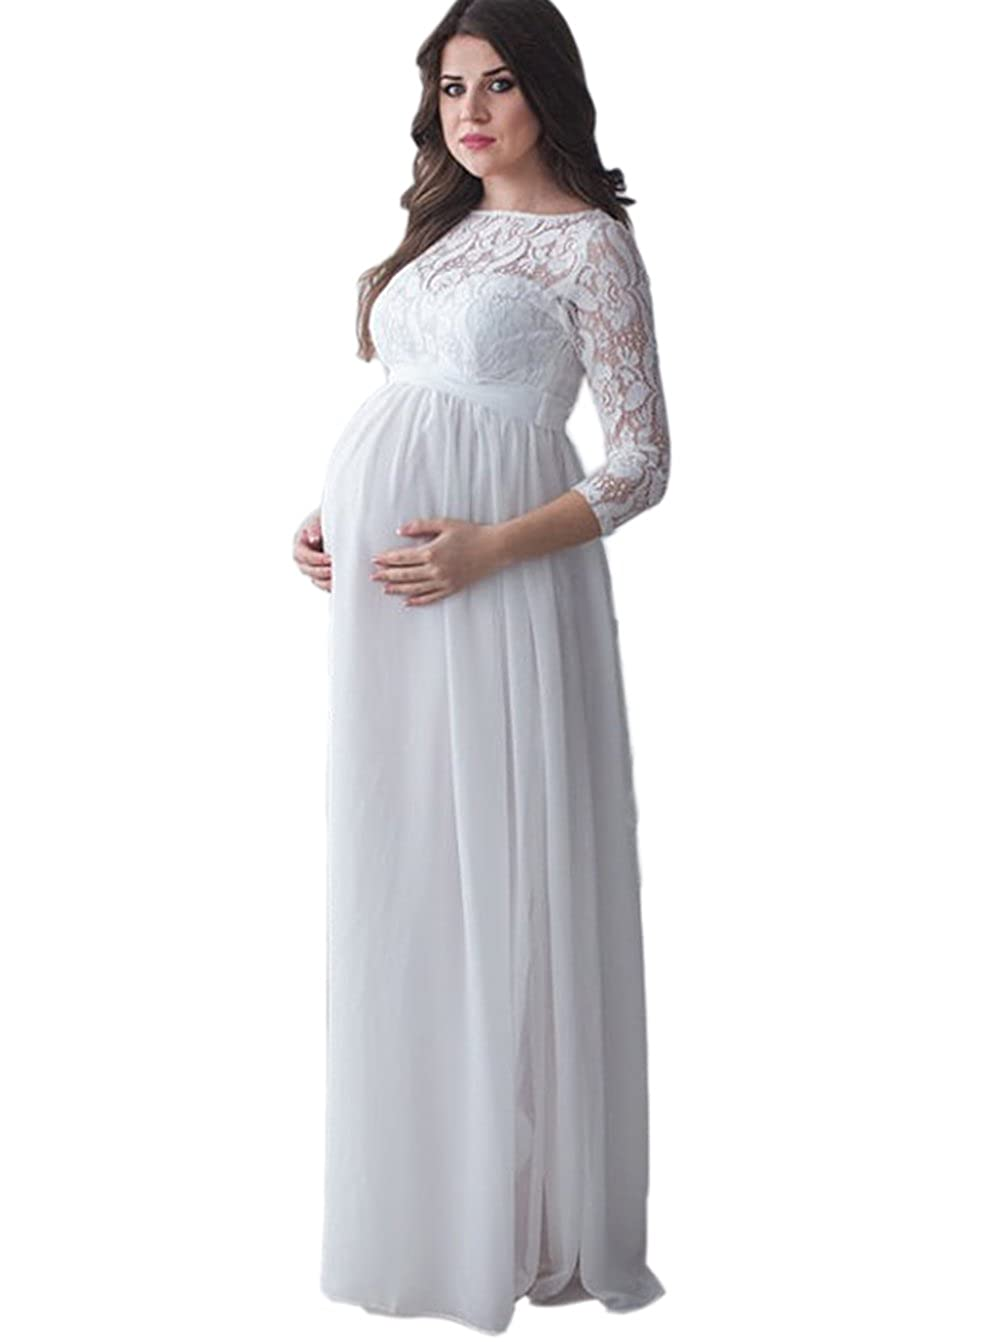 69c36dc4f5 Lace Maternity Wedding Dresses | Huston Fislar Photography